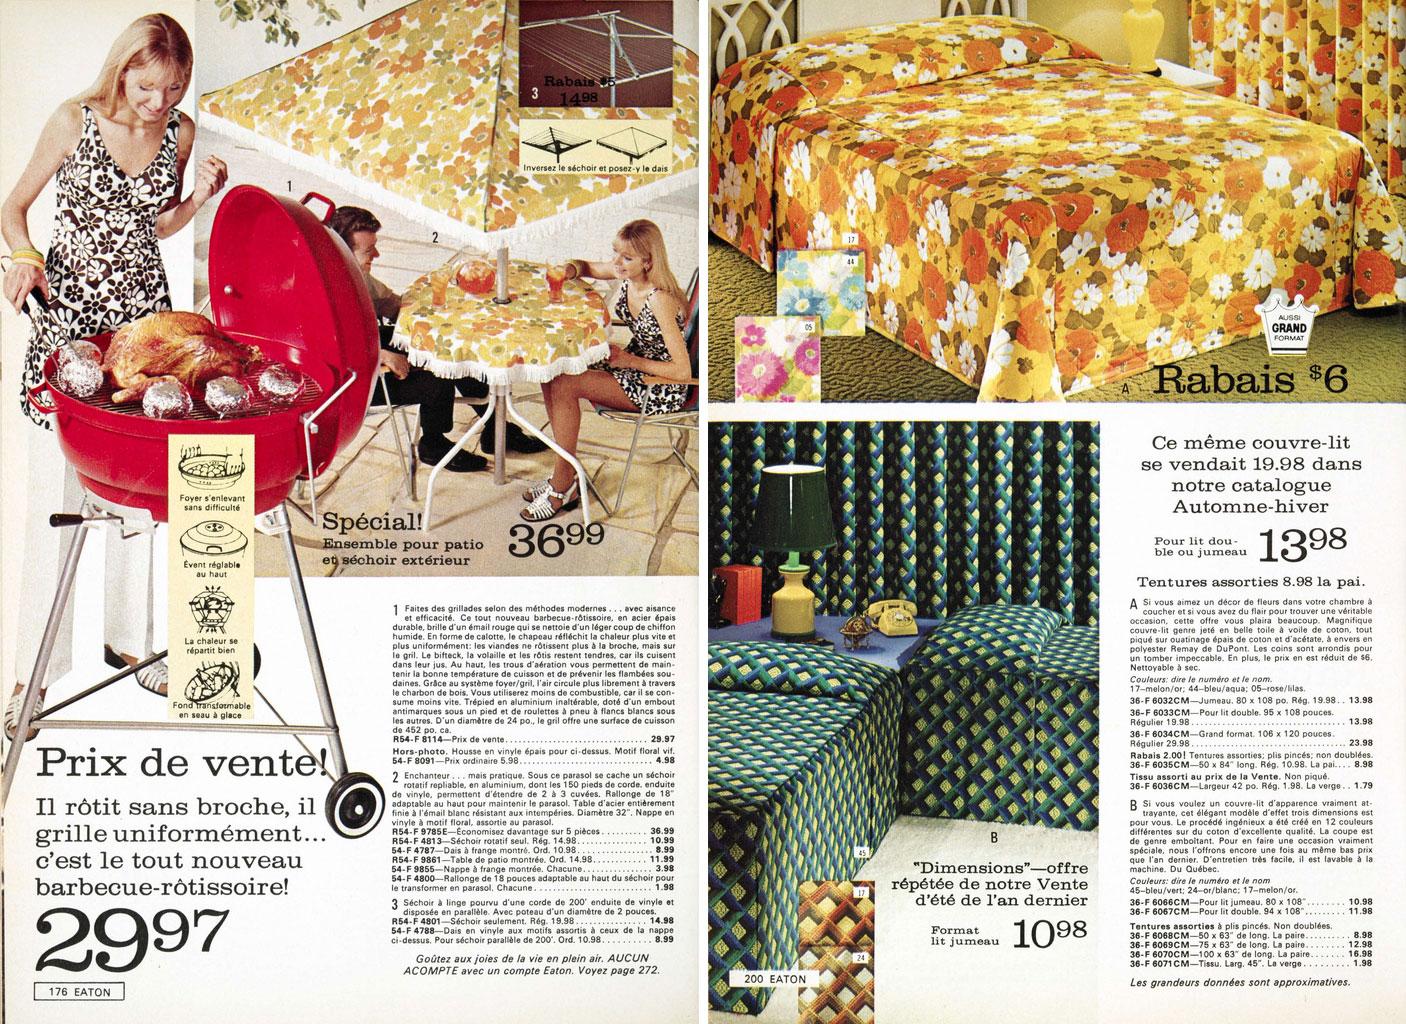 new york apartments in the 70s, 70s interior design, hippie decor, hippy homes, 1970s nyc apartment, apartment life magazine